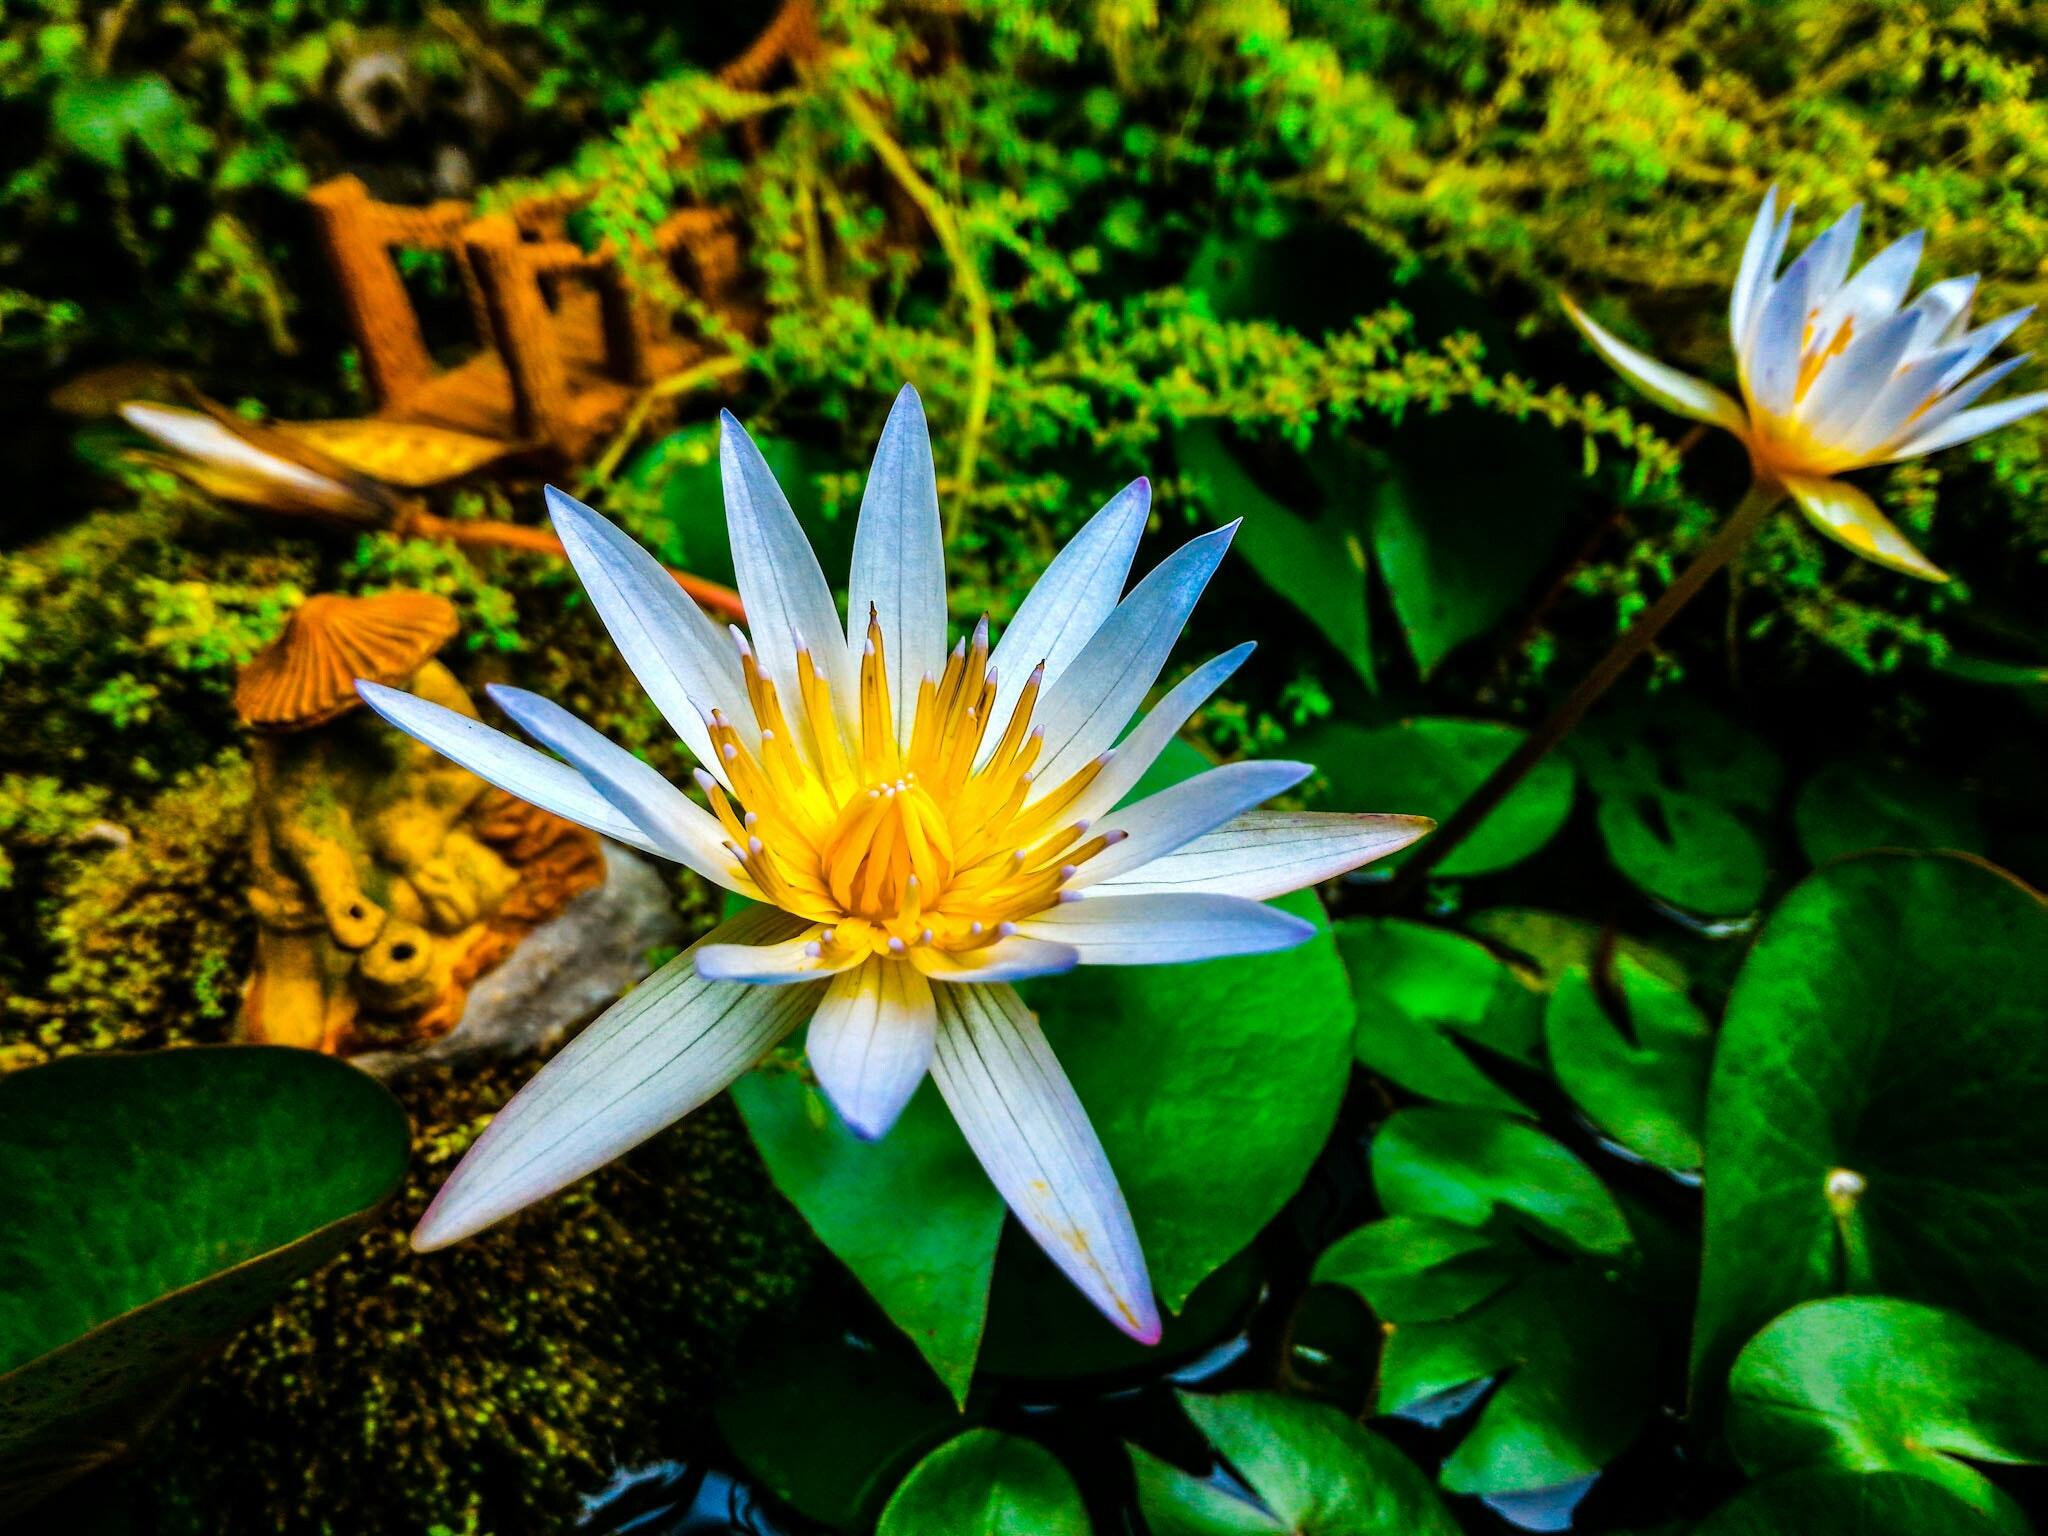 aquatic-plant-beautiful-bloom-724117